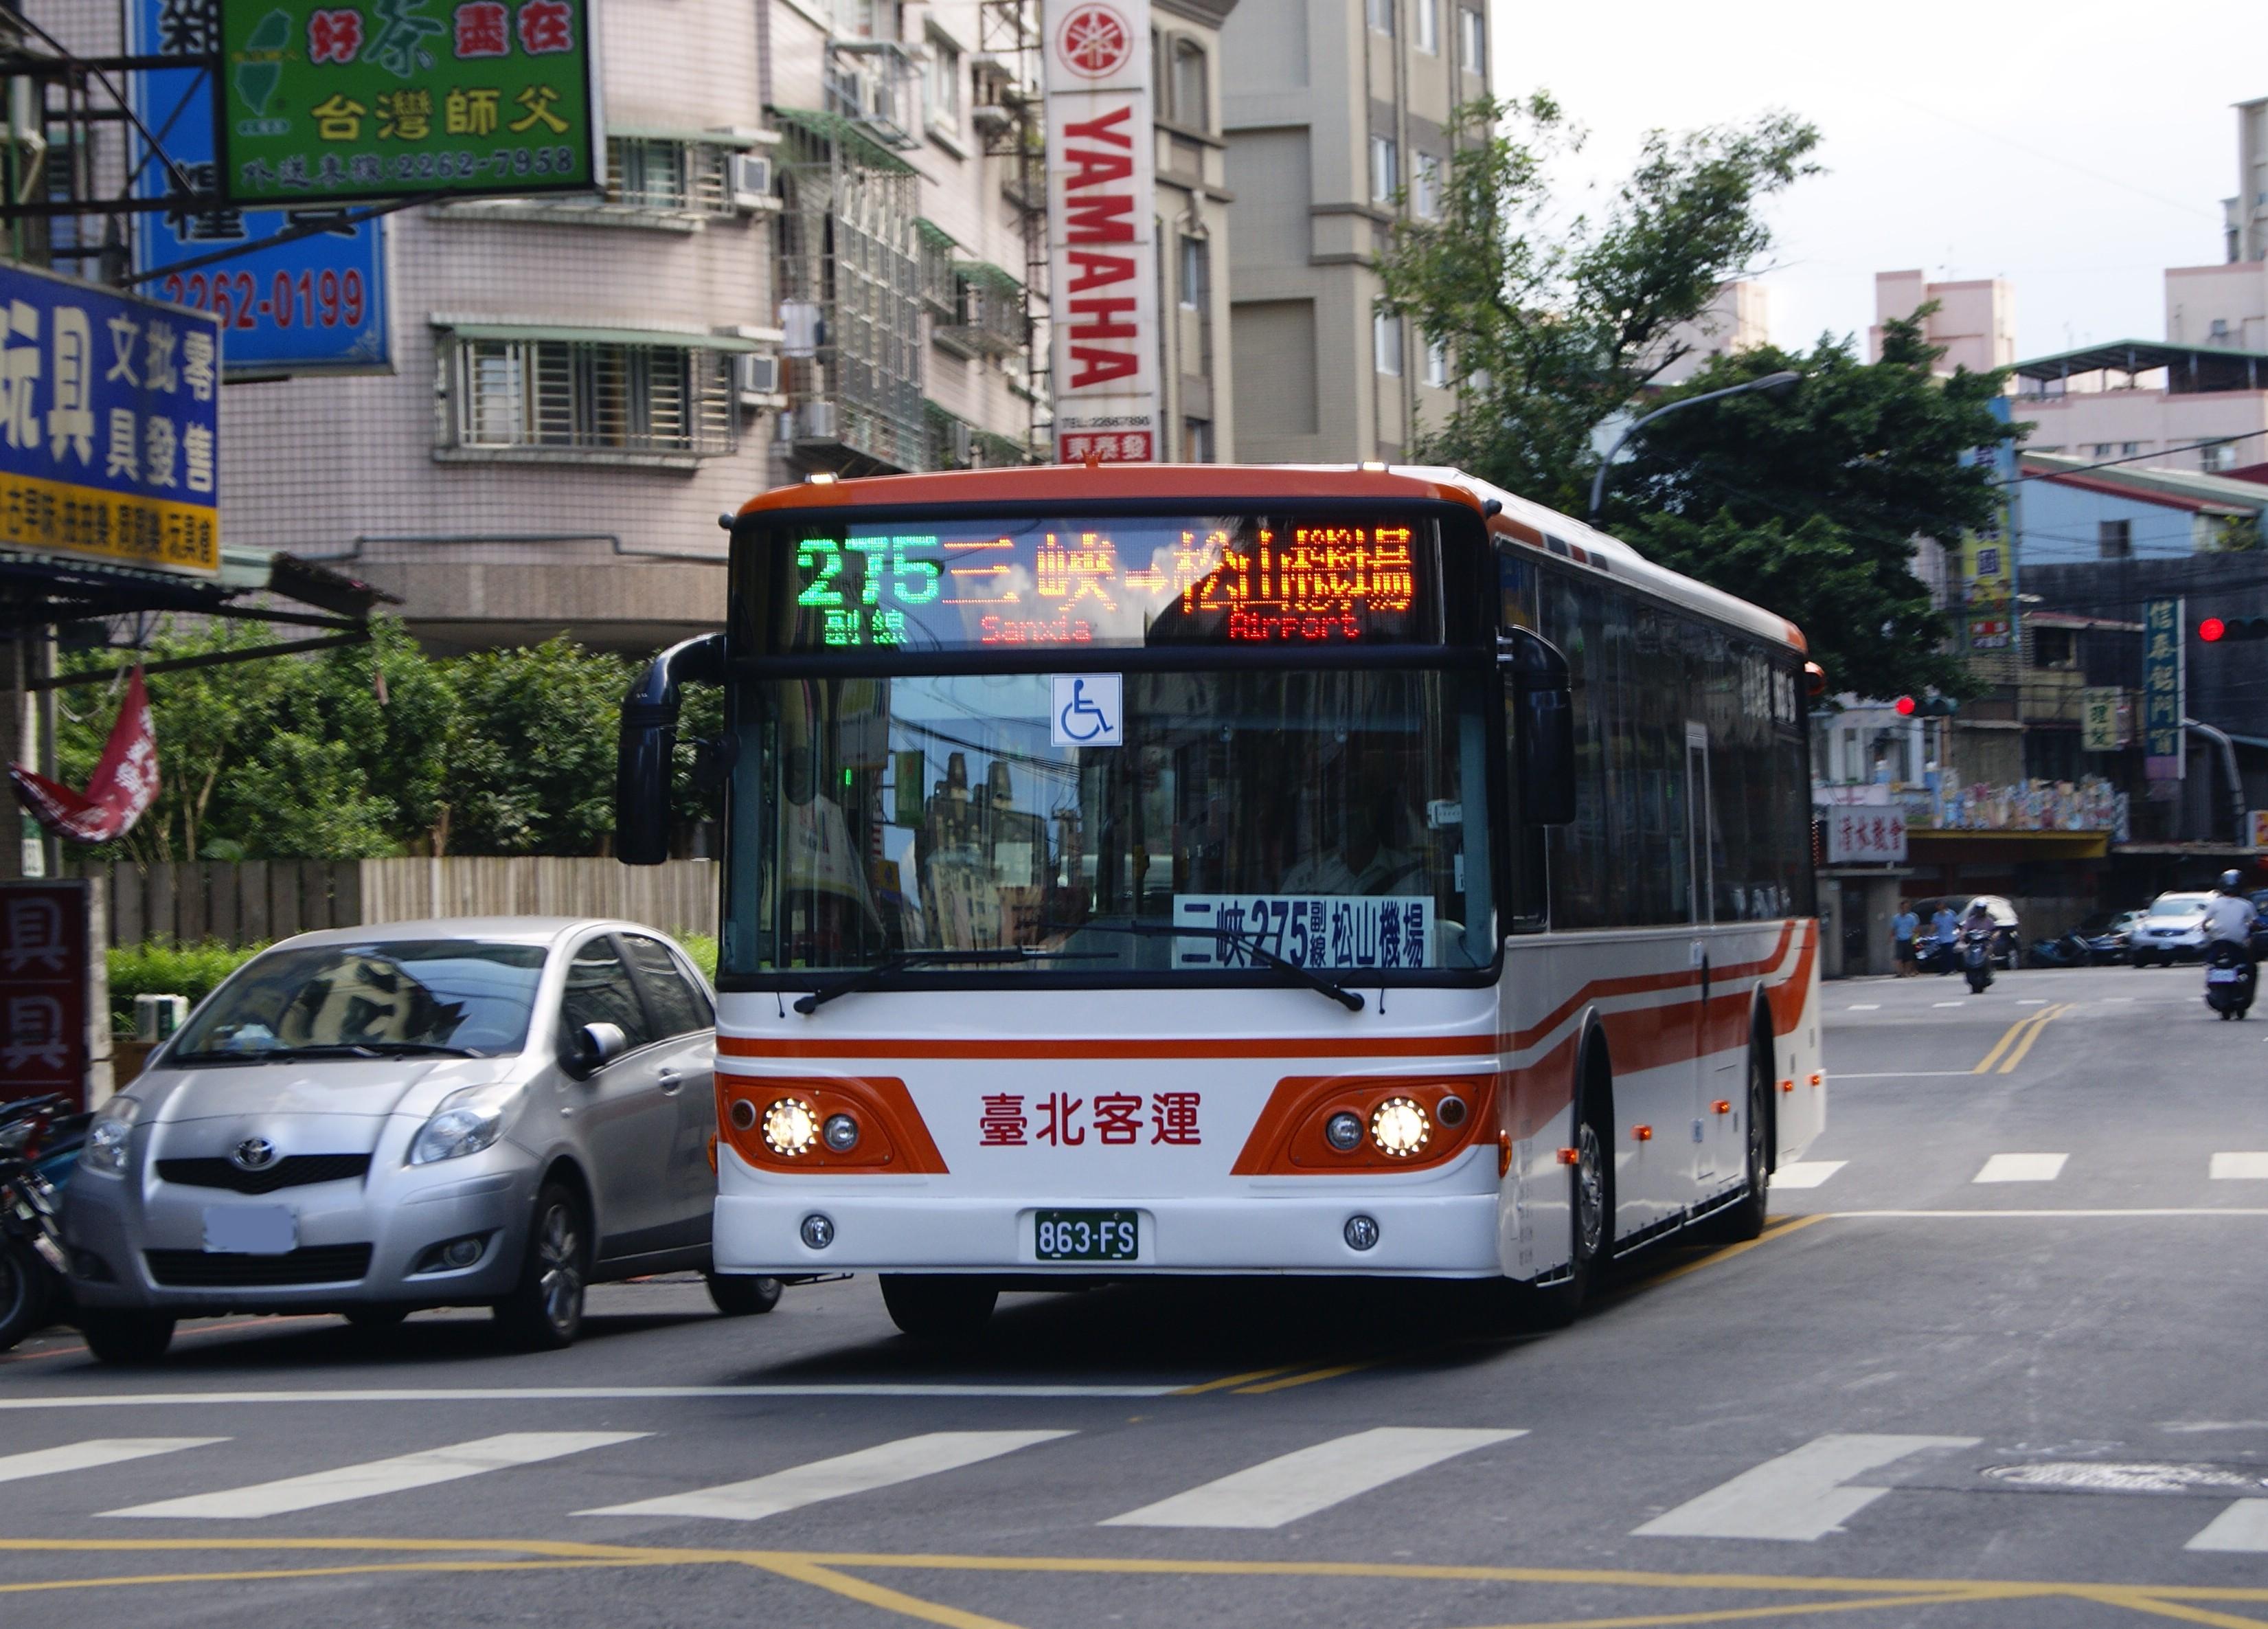 File:臺北客運 275副線 863-FS.JPG